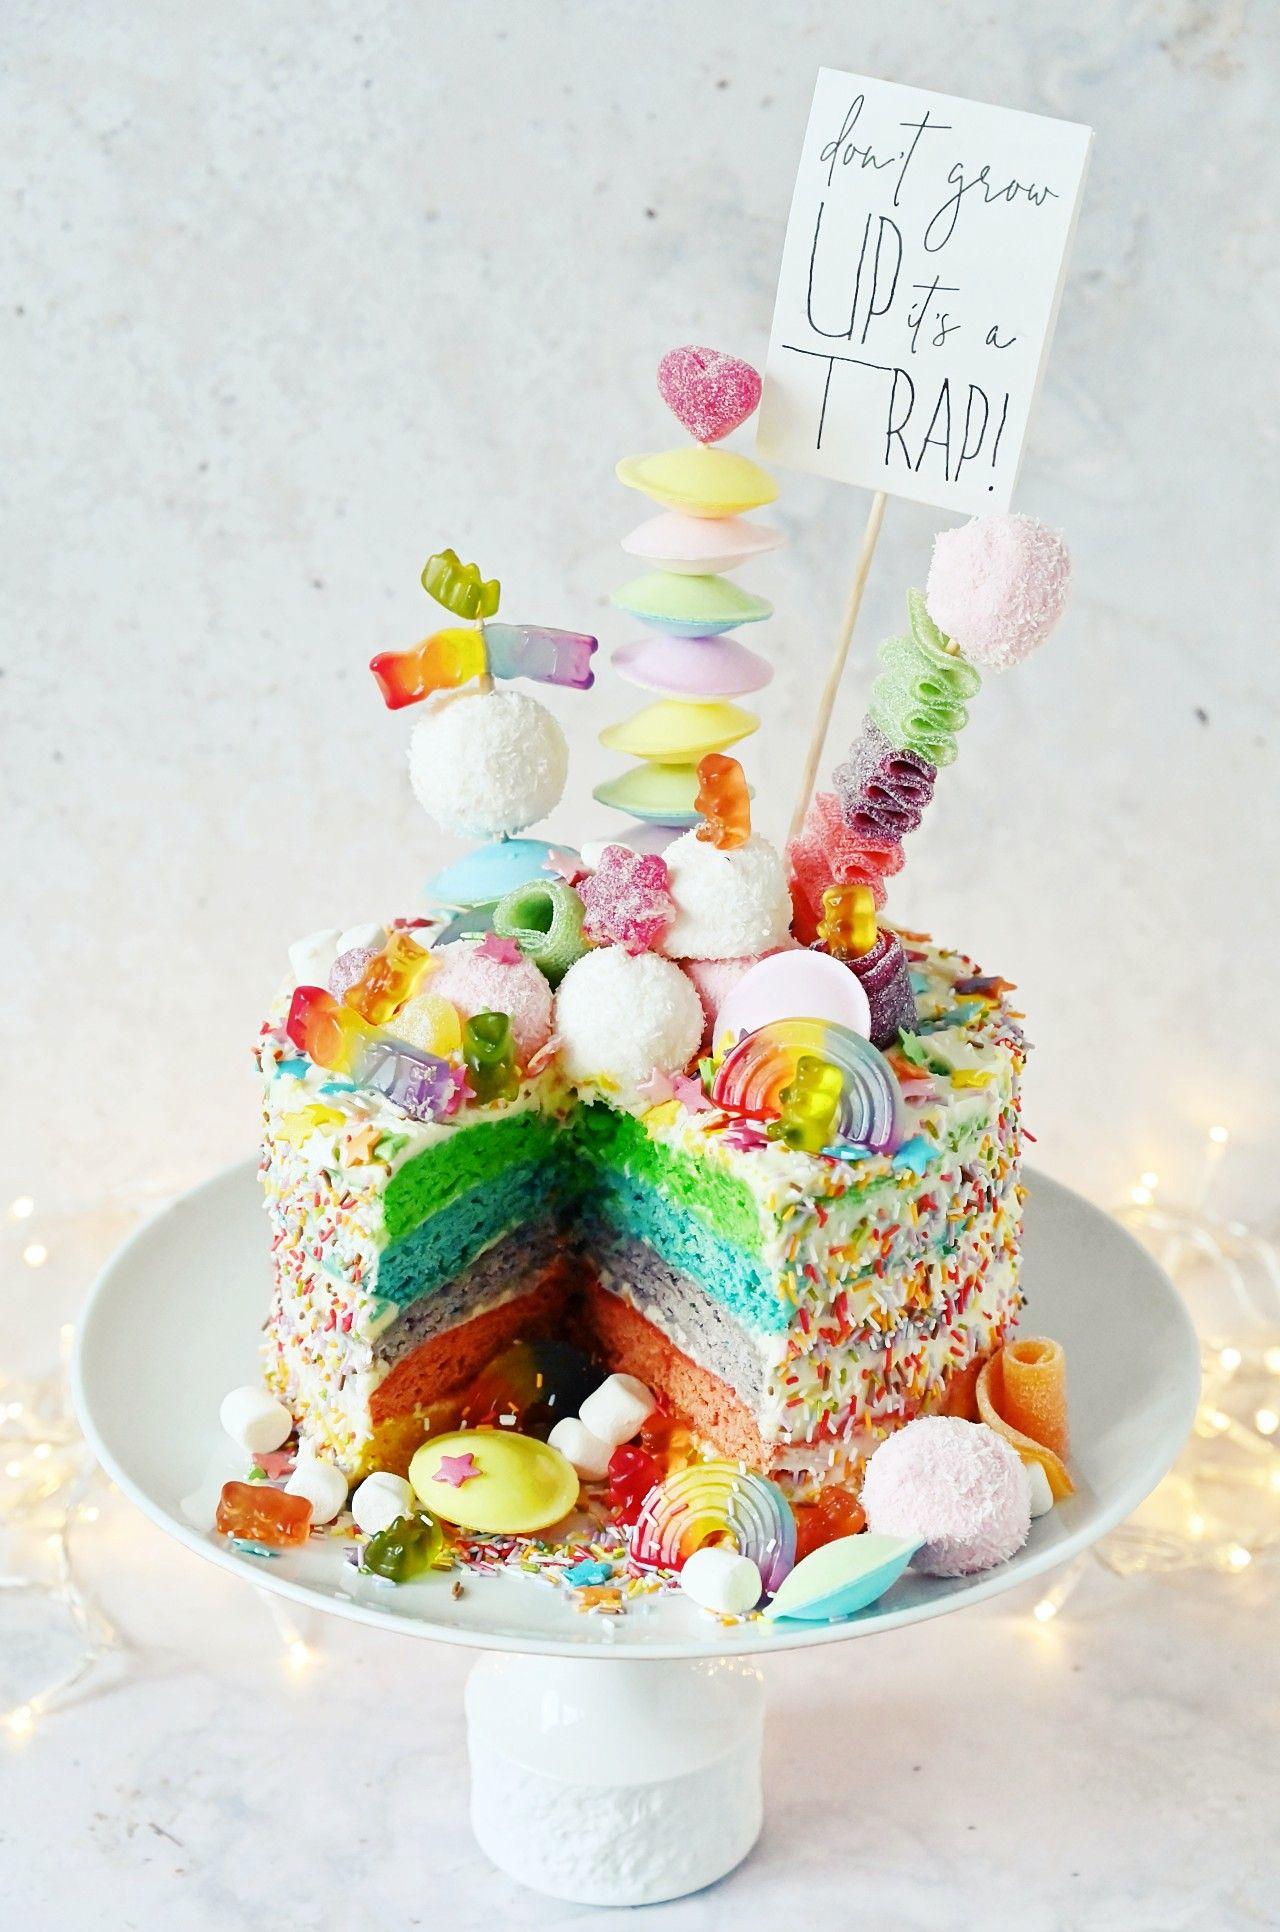 Regenbogen Torte Backen Rezept Fur Rainbow Candy Cake In 2020 Regenbogentorte Kuchen Kindergeburtstag Torte Kindergeburtstag